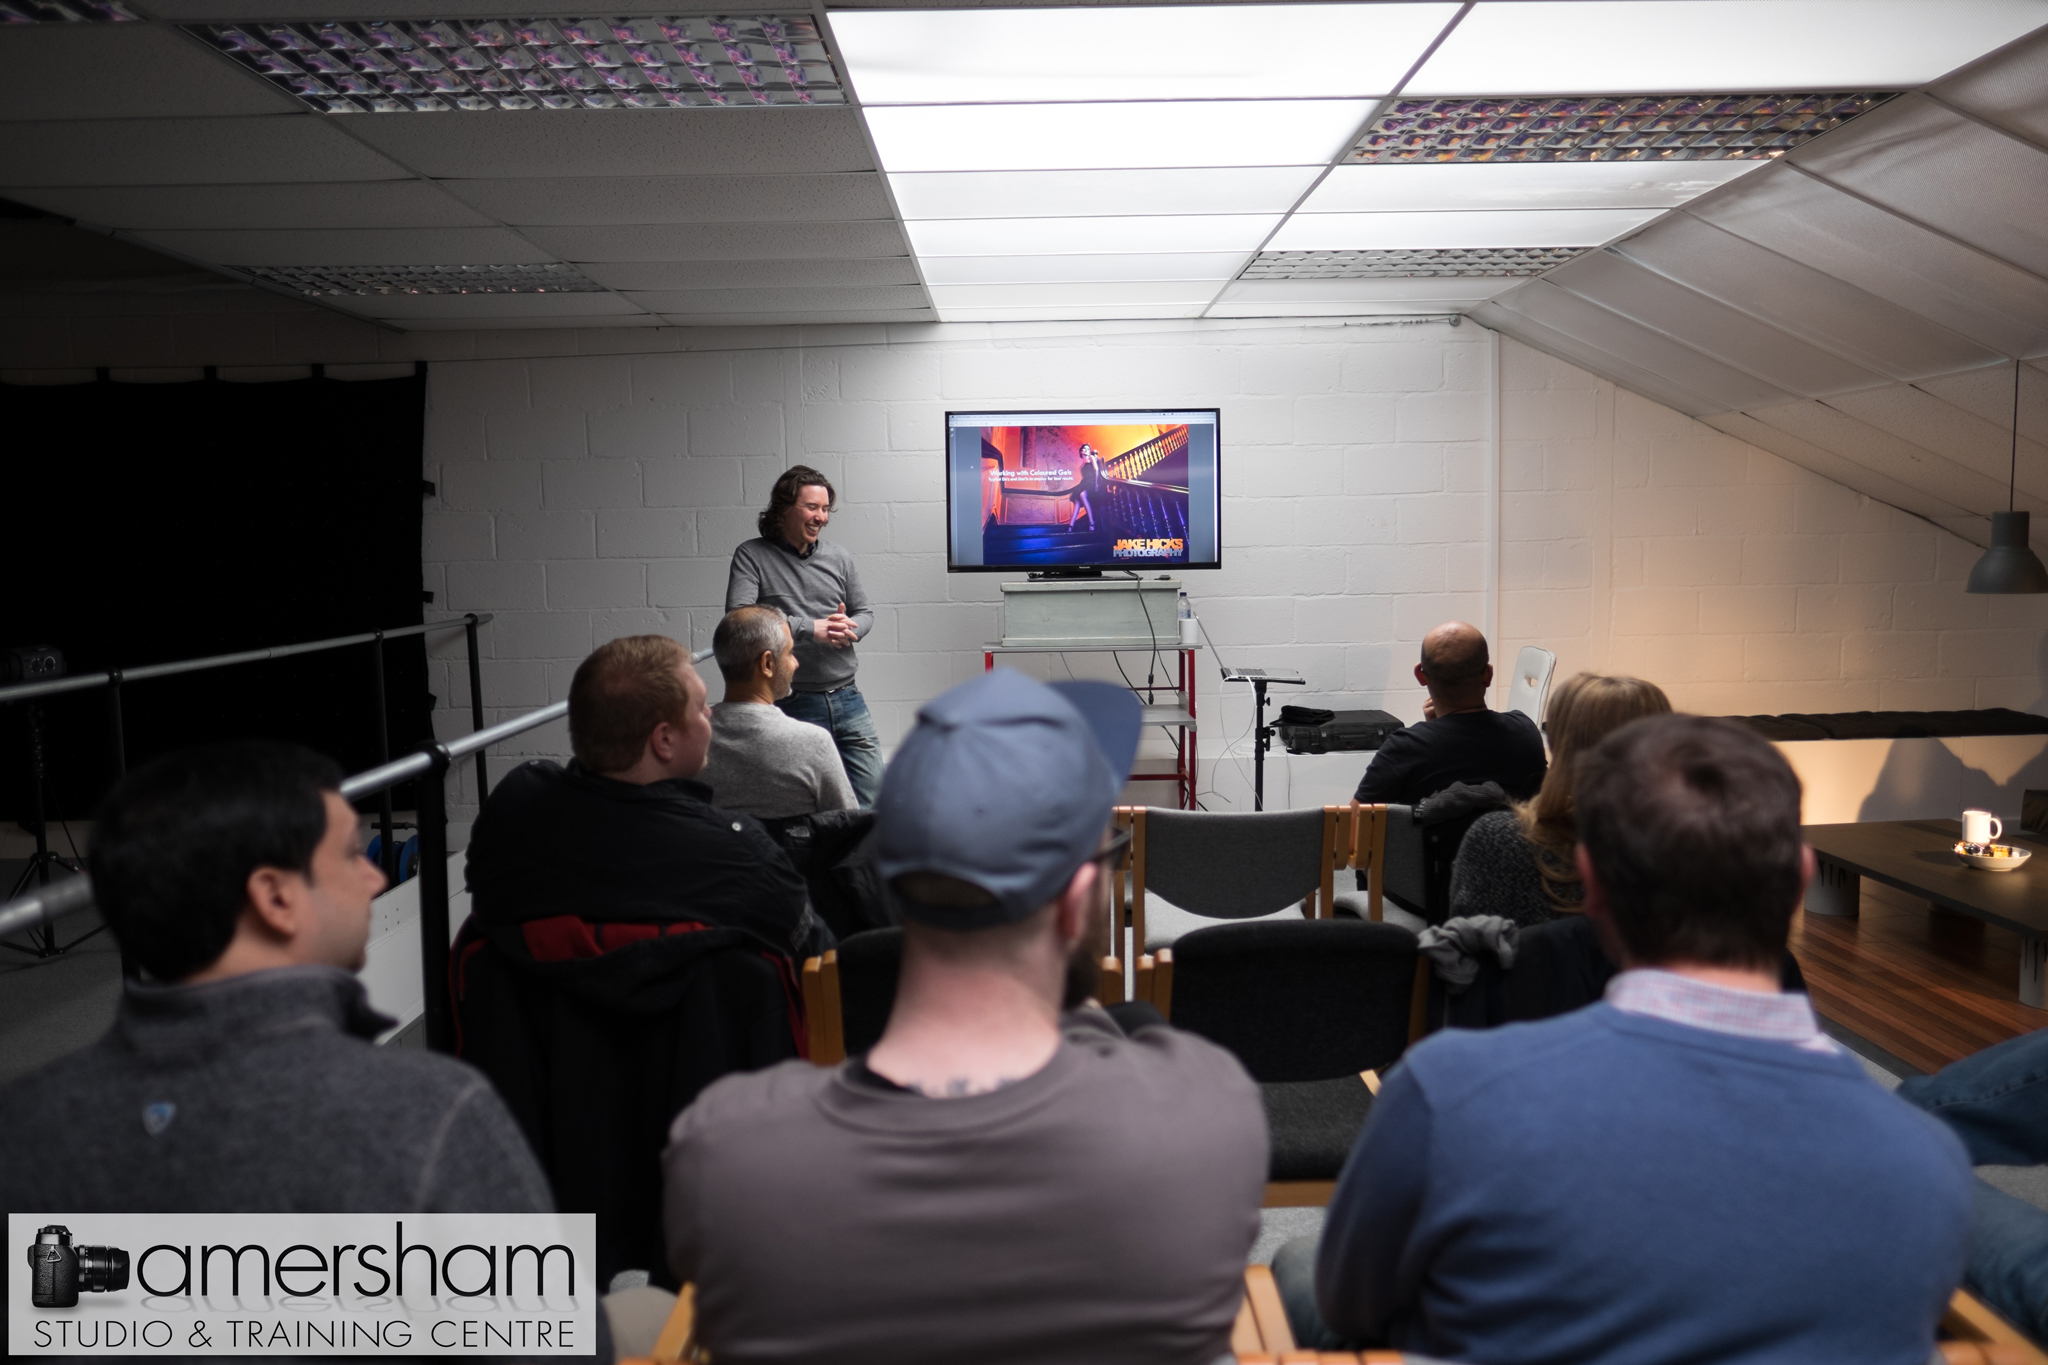 DSCF8210-Jake-Hicks-Workshop-Laugh-FB.jpg